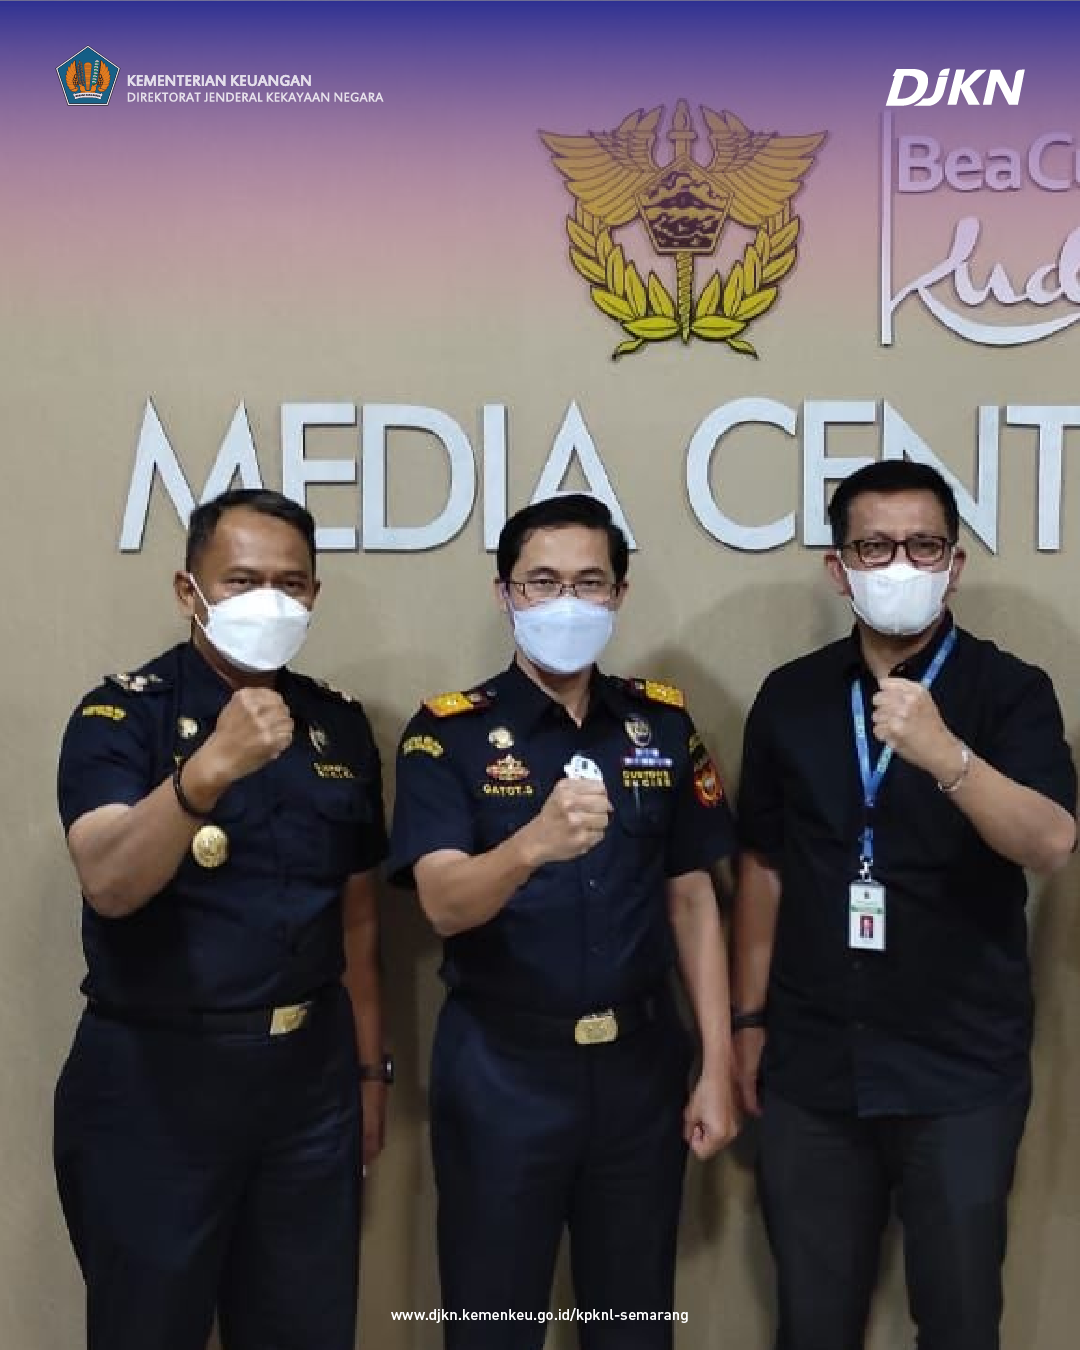 Tuntaskan BKPN, KPKNL Semarang Lakukan Koordinasi Dengan KPPBC Kudus